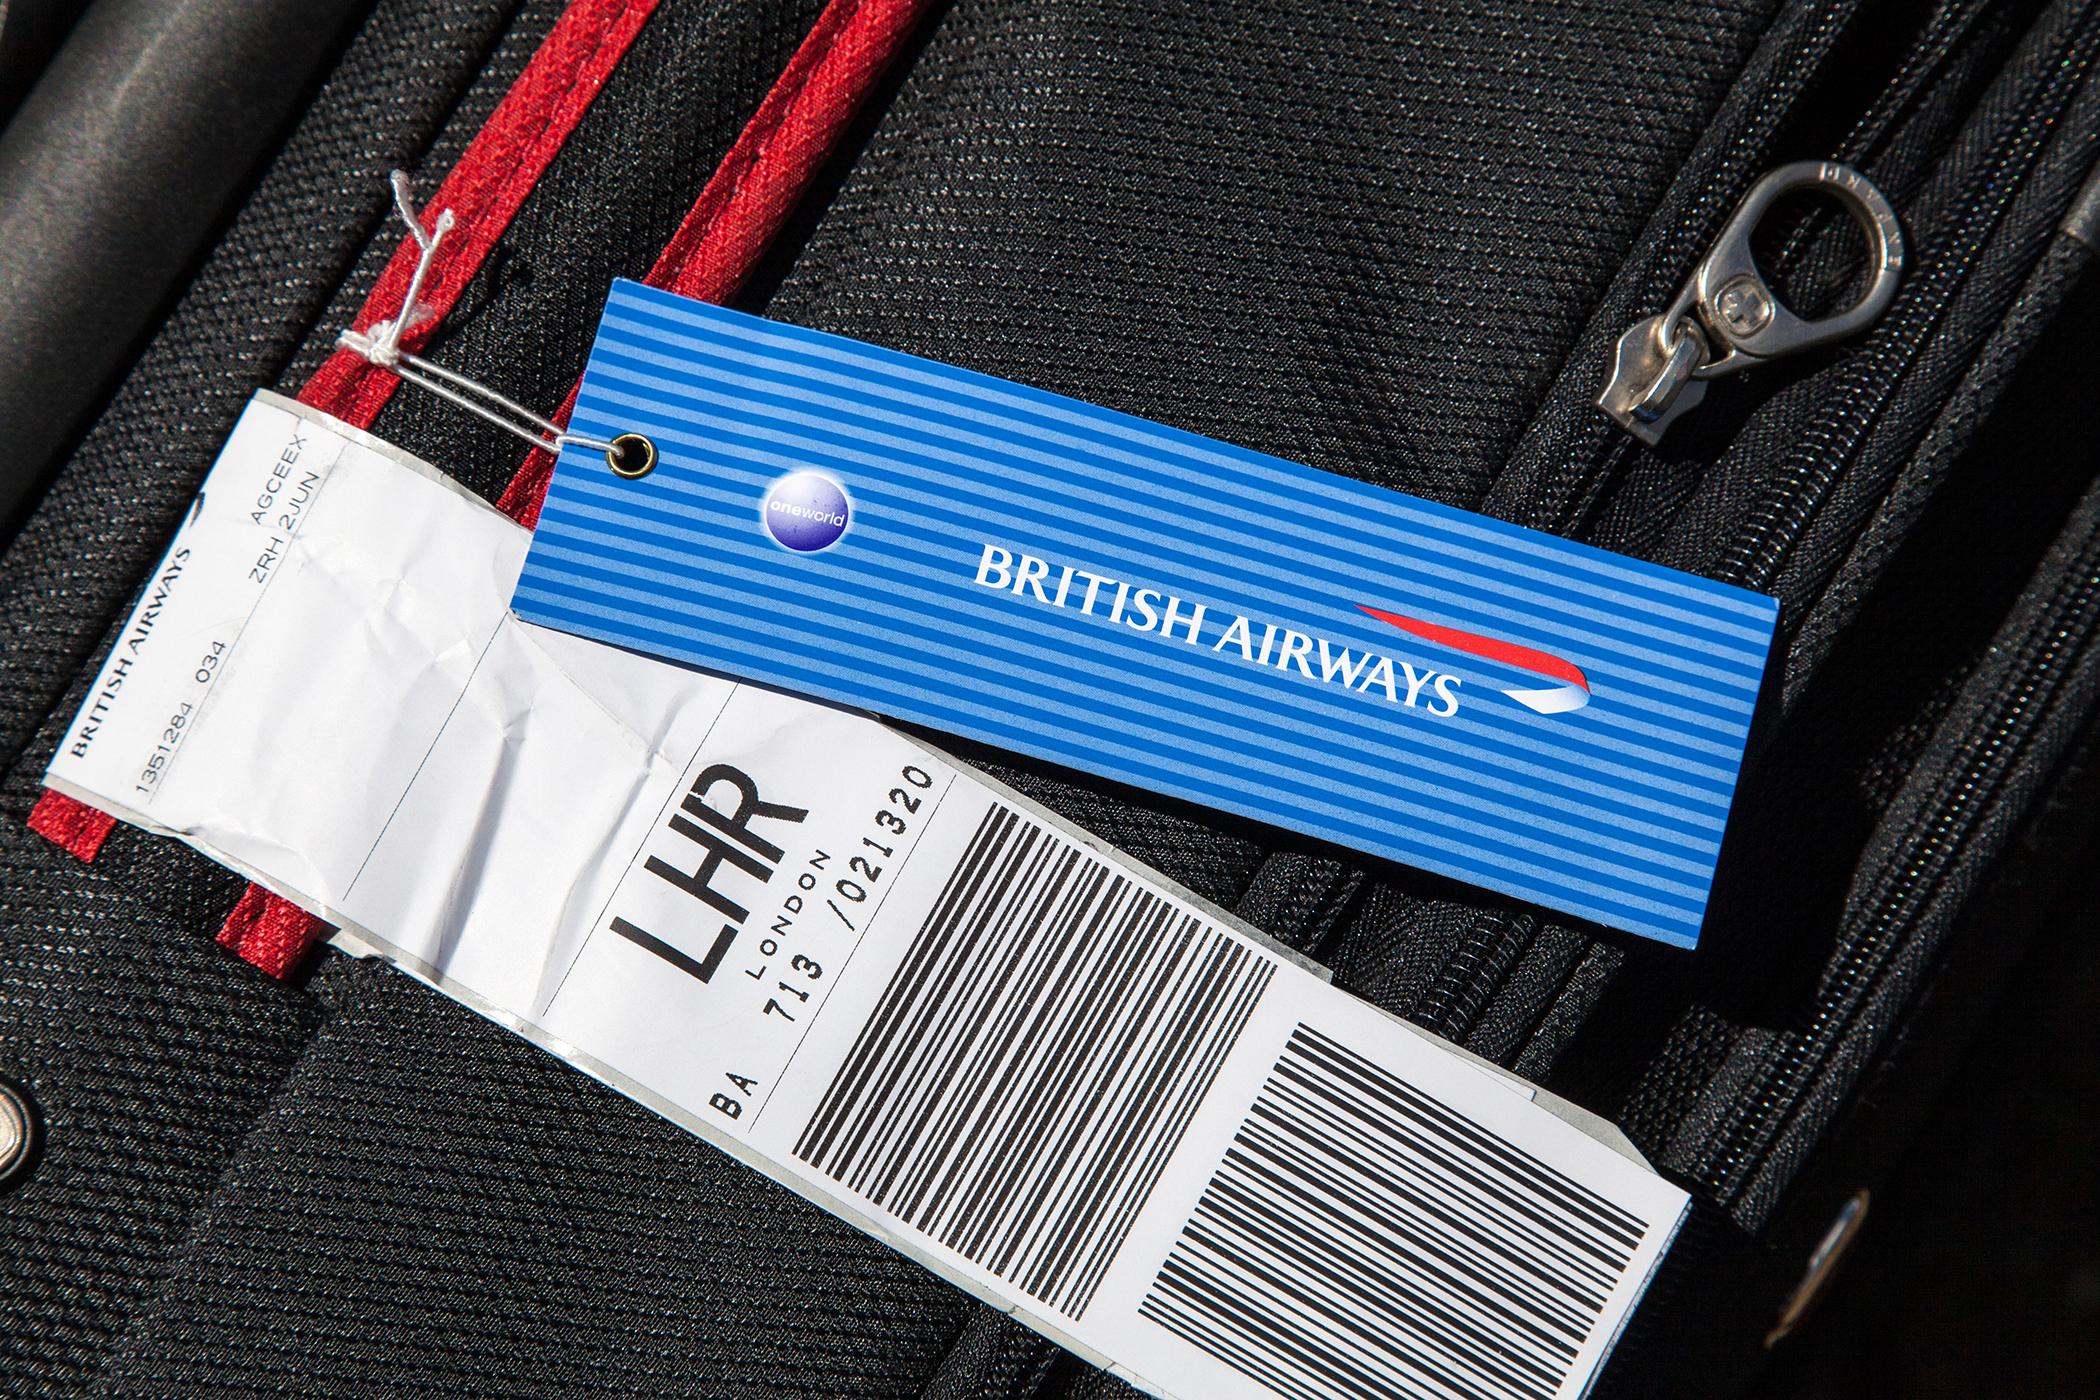 British Airways luggage tag